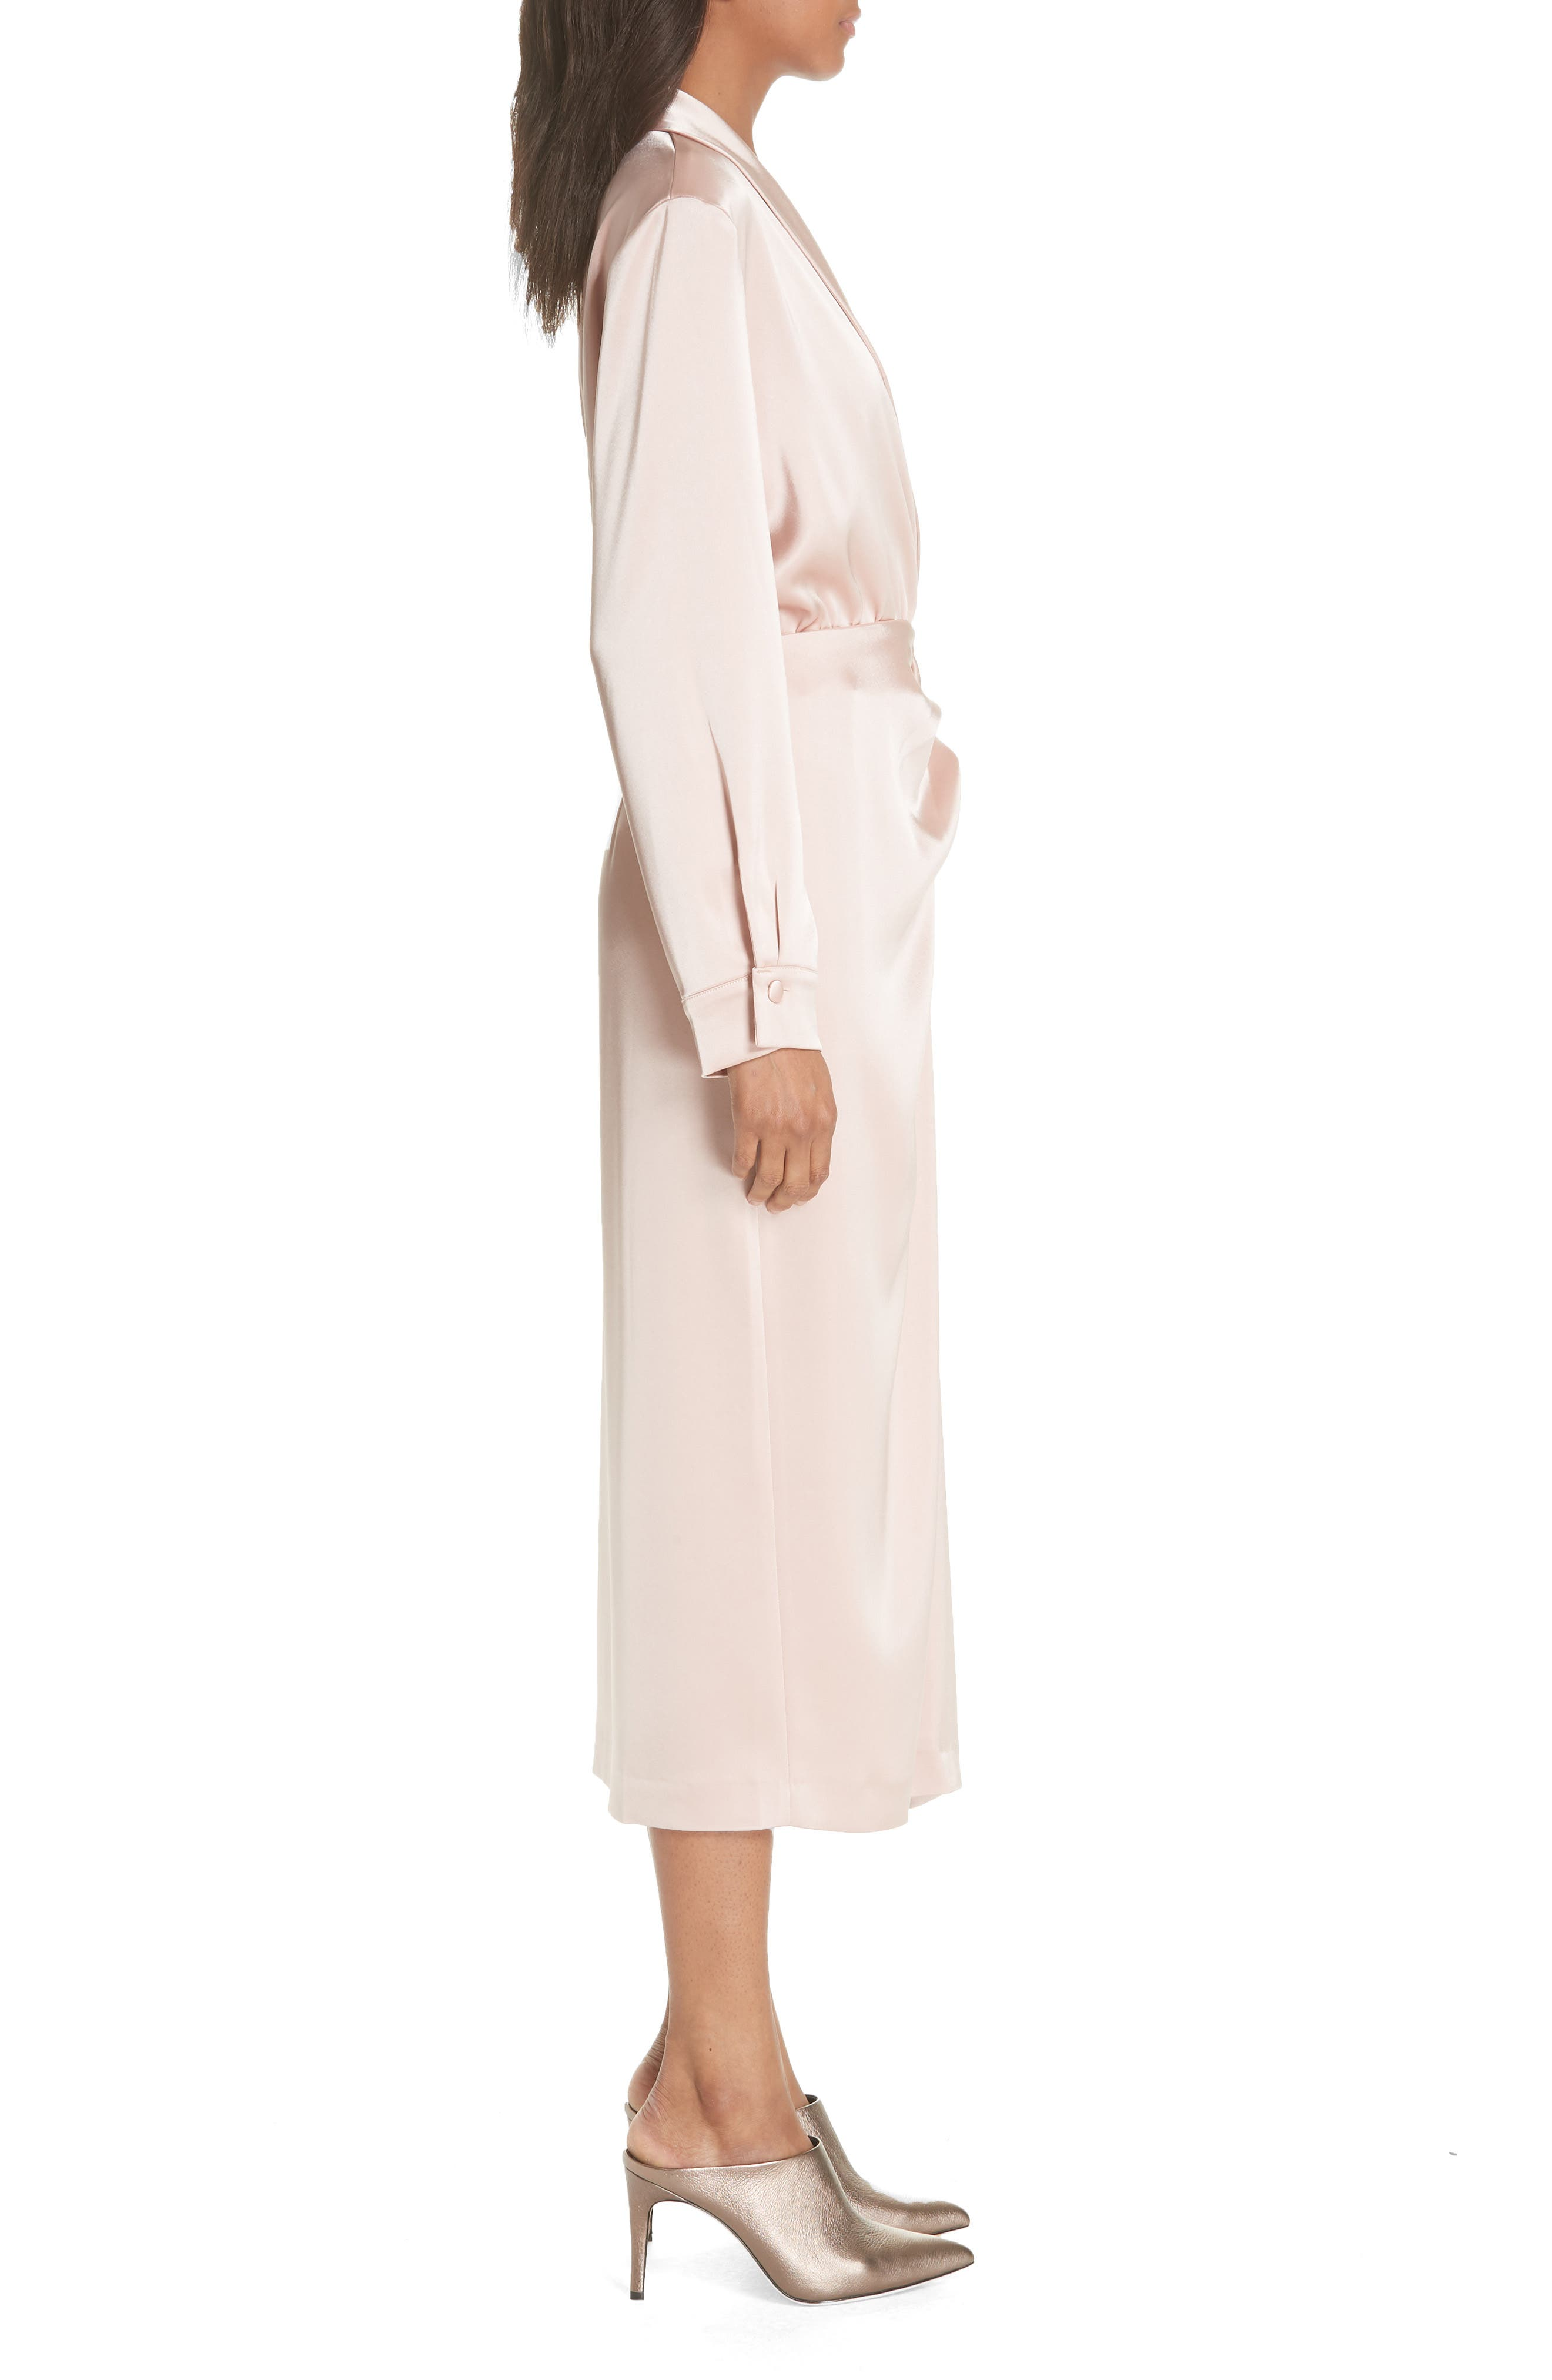 Ezra Satin Wrap Dress,                             Alternate thumbnail 3, color,                             DESERT ROSE